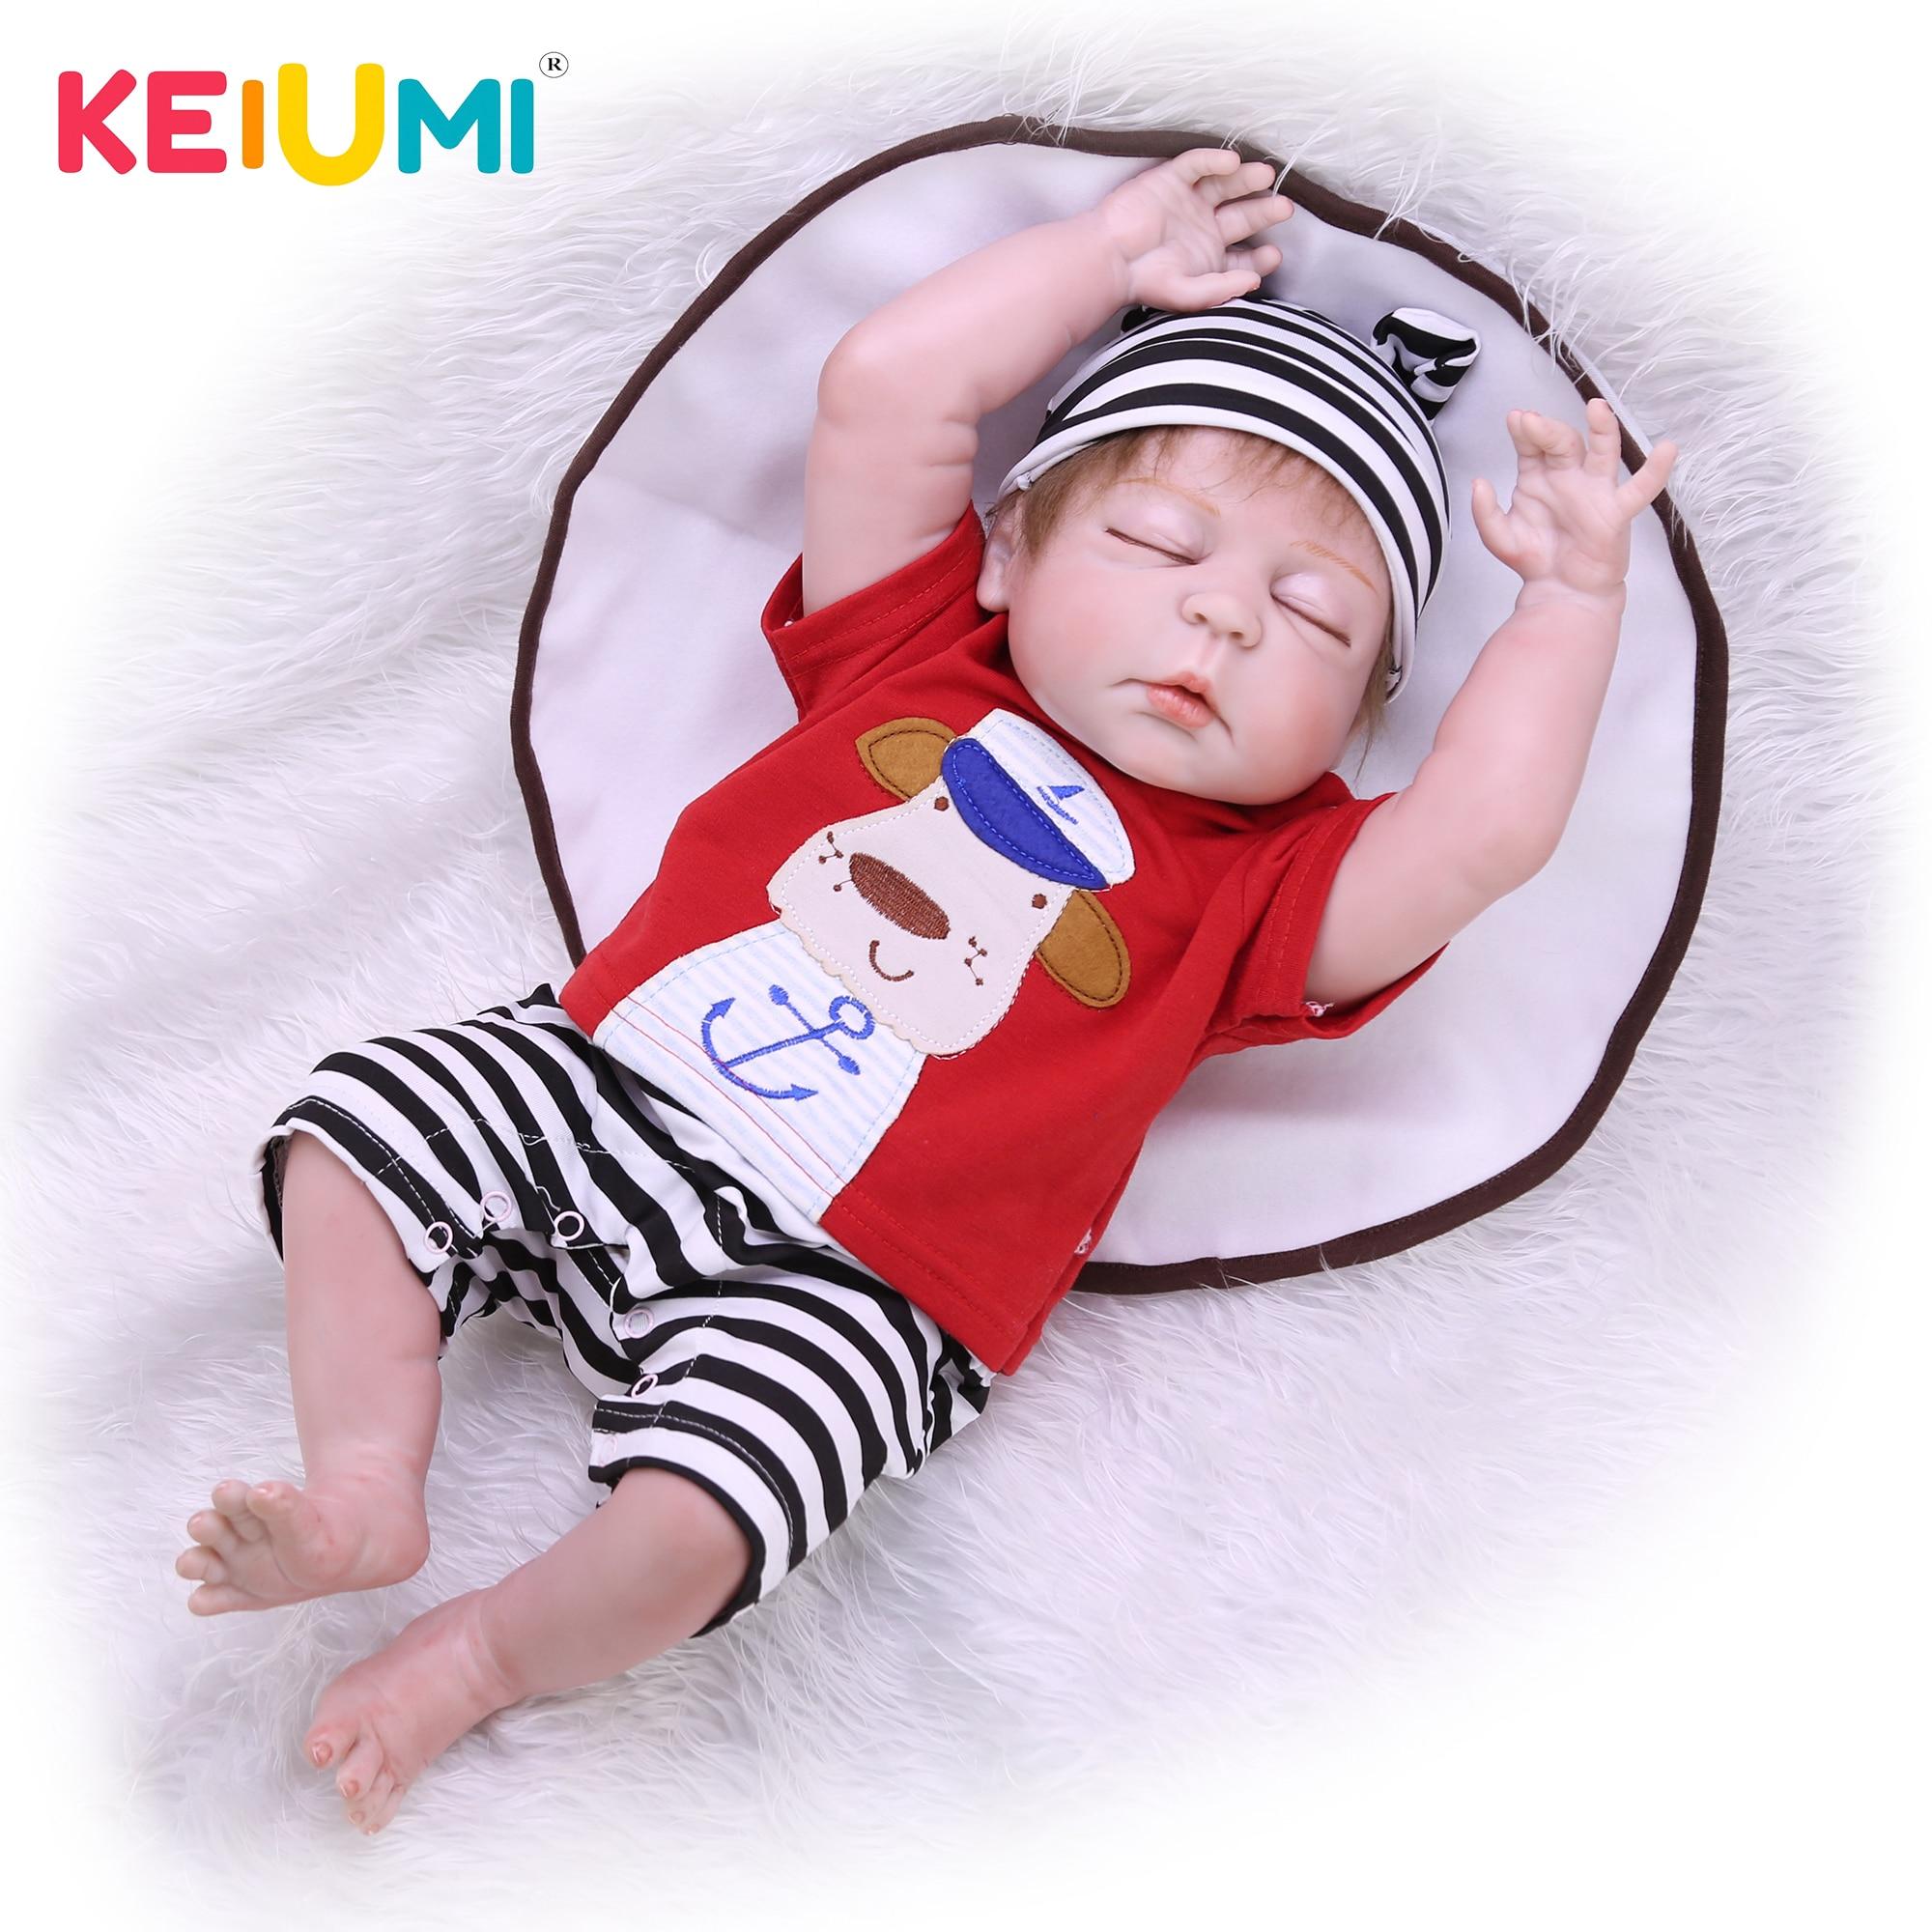 23 Inch Realistic Reborn Babies Doll Full Silicone Body Vinyl Lifelike Alive Boy Baby Dolls Closed